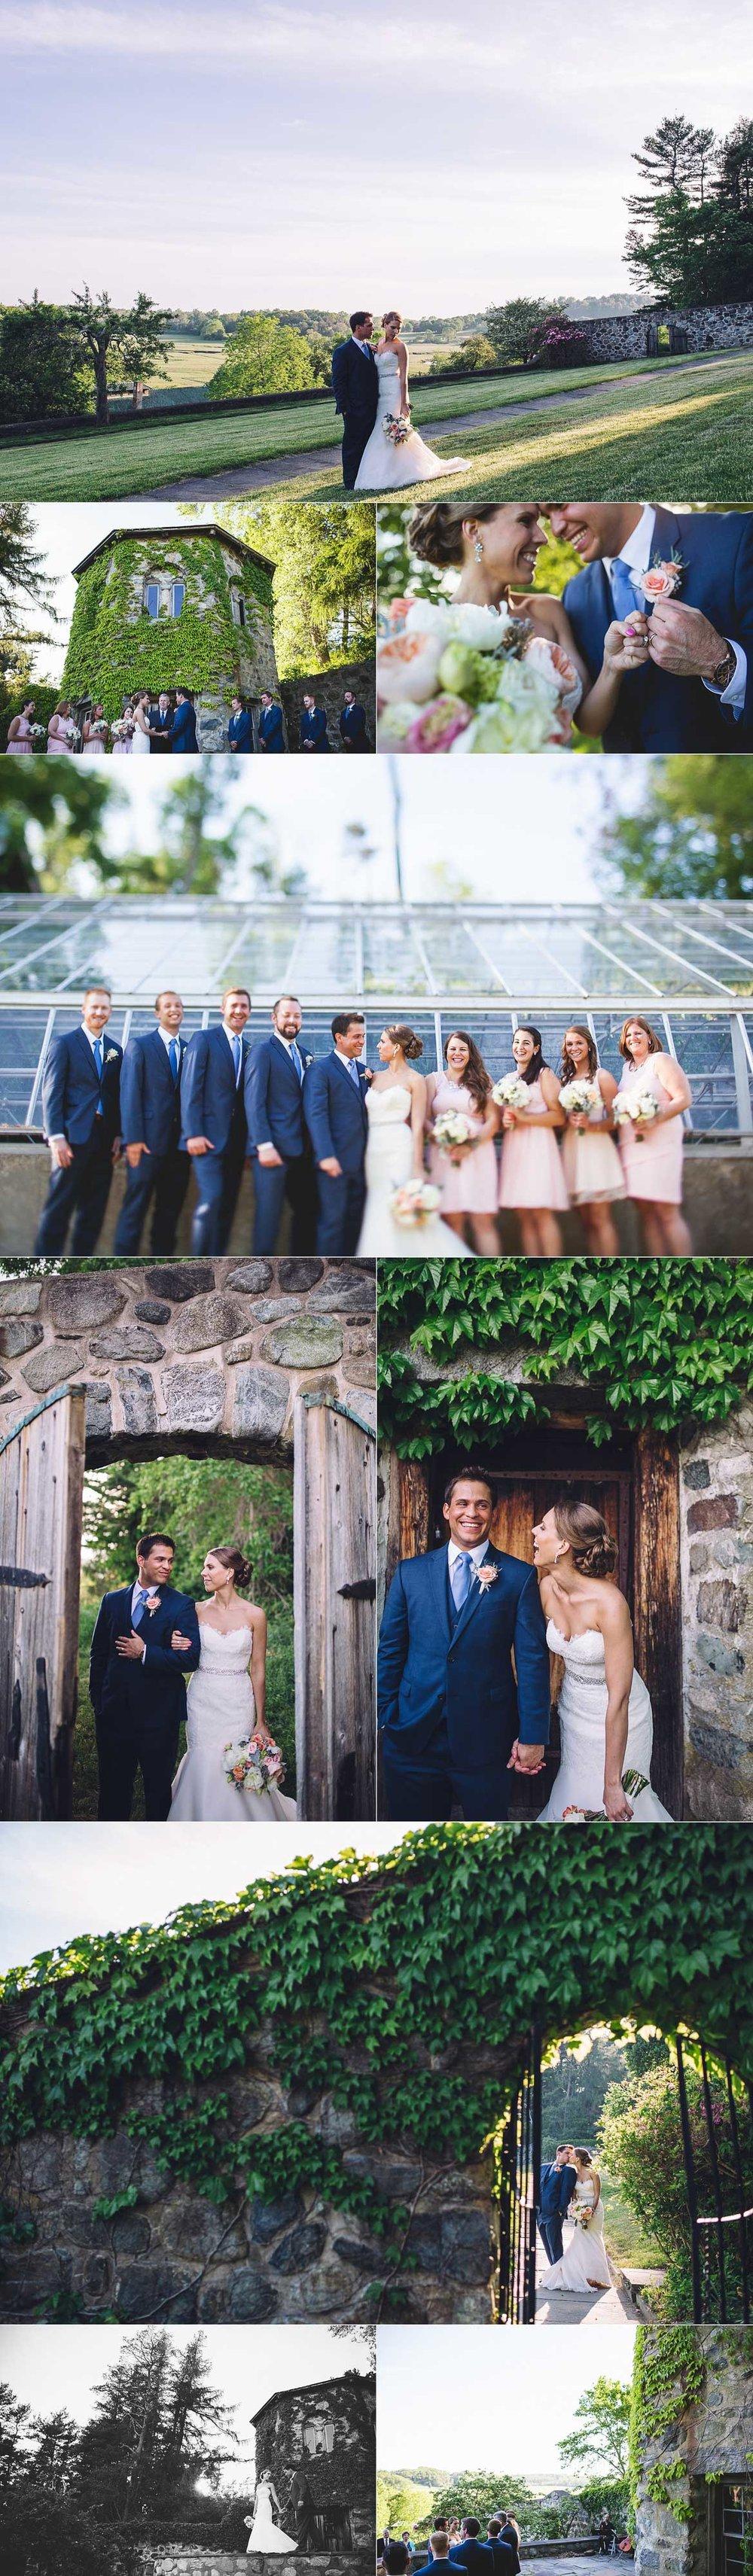 Barn at Crane Estate Wedding-1-2.jpg